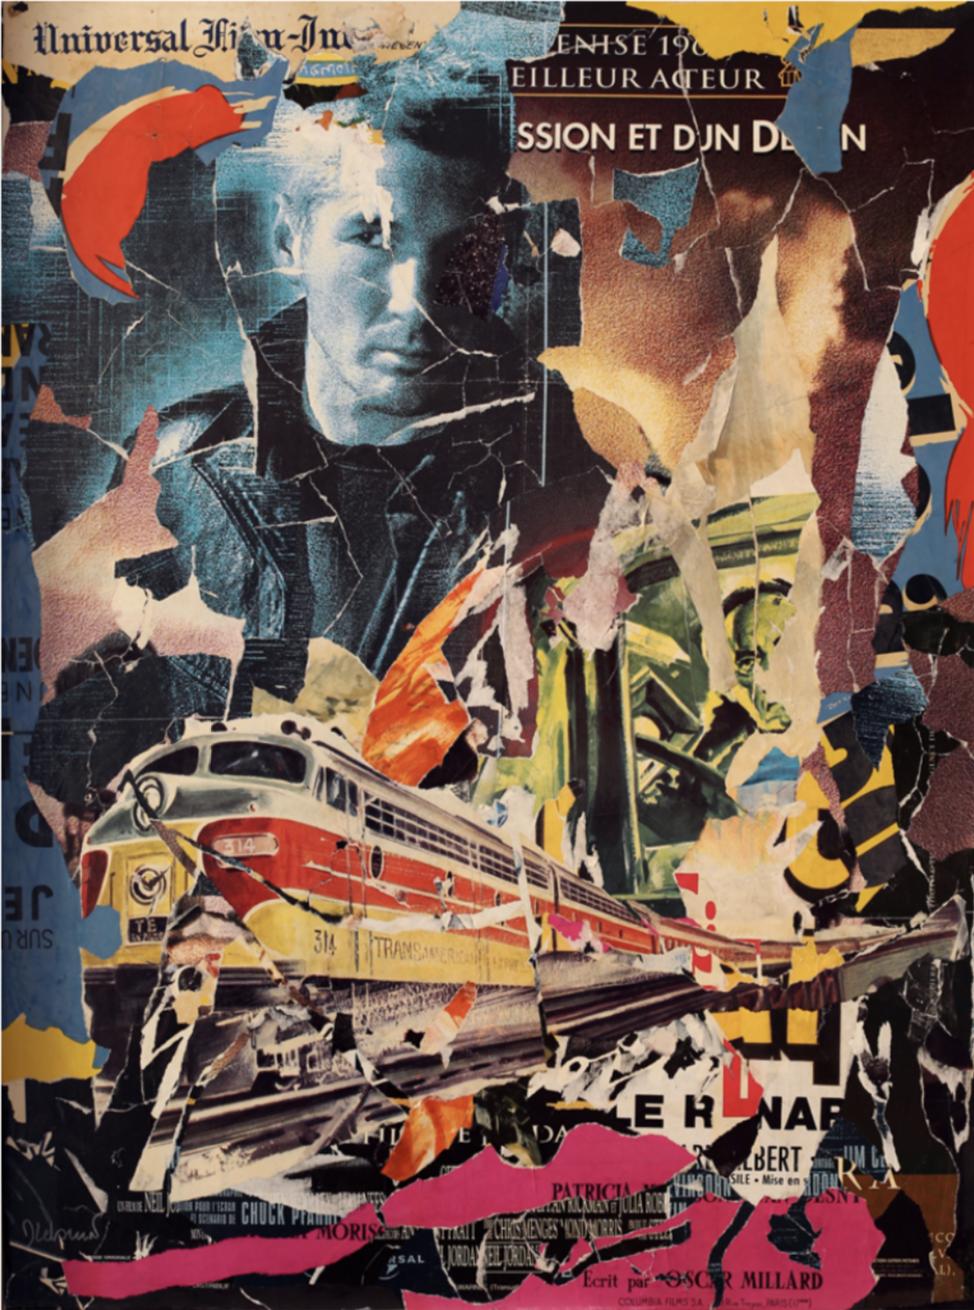 Dominique Lebrun, Transamerican, 2010, Collage on canvas 51 x 28 in